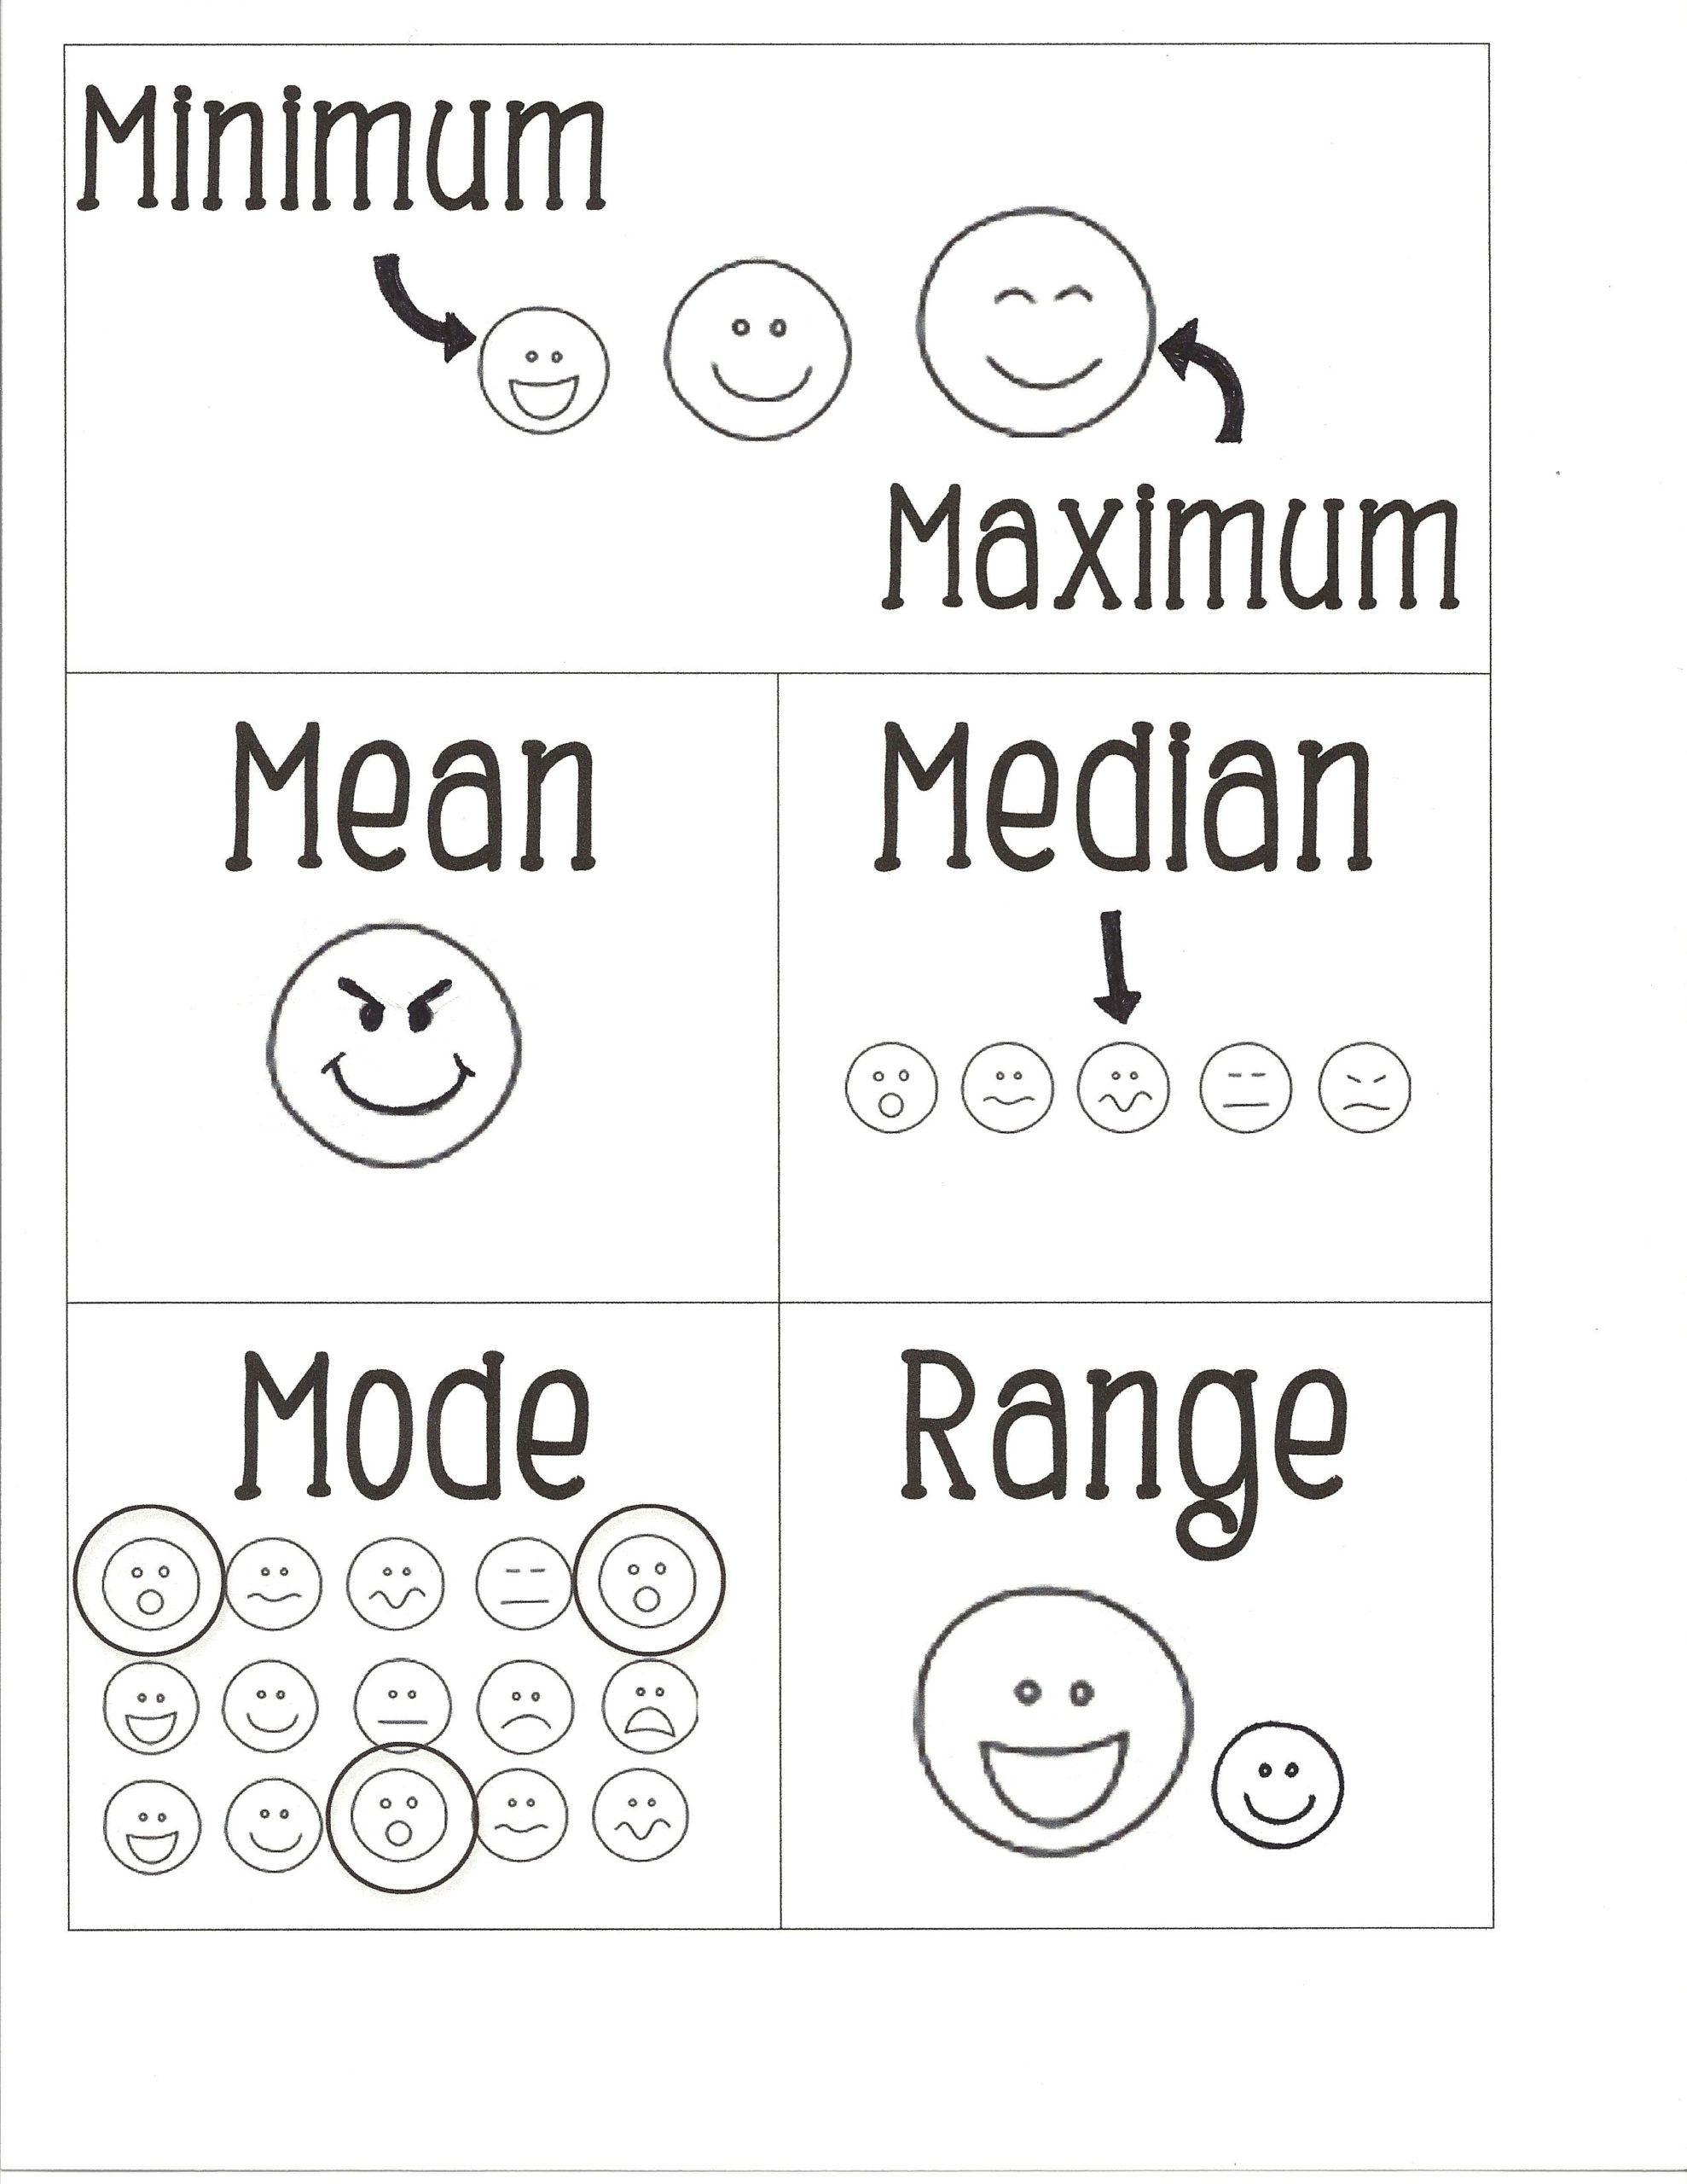 Pictograph Worksheets For Kindergarten Worksheet For Kindergarten Free Math Worksheets Mean Median And Mode Math Worksheets [ 2560 x 1978 Pixel ]